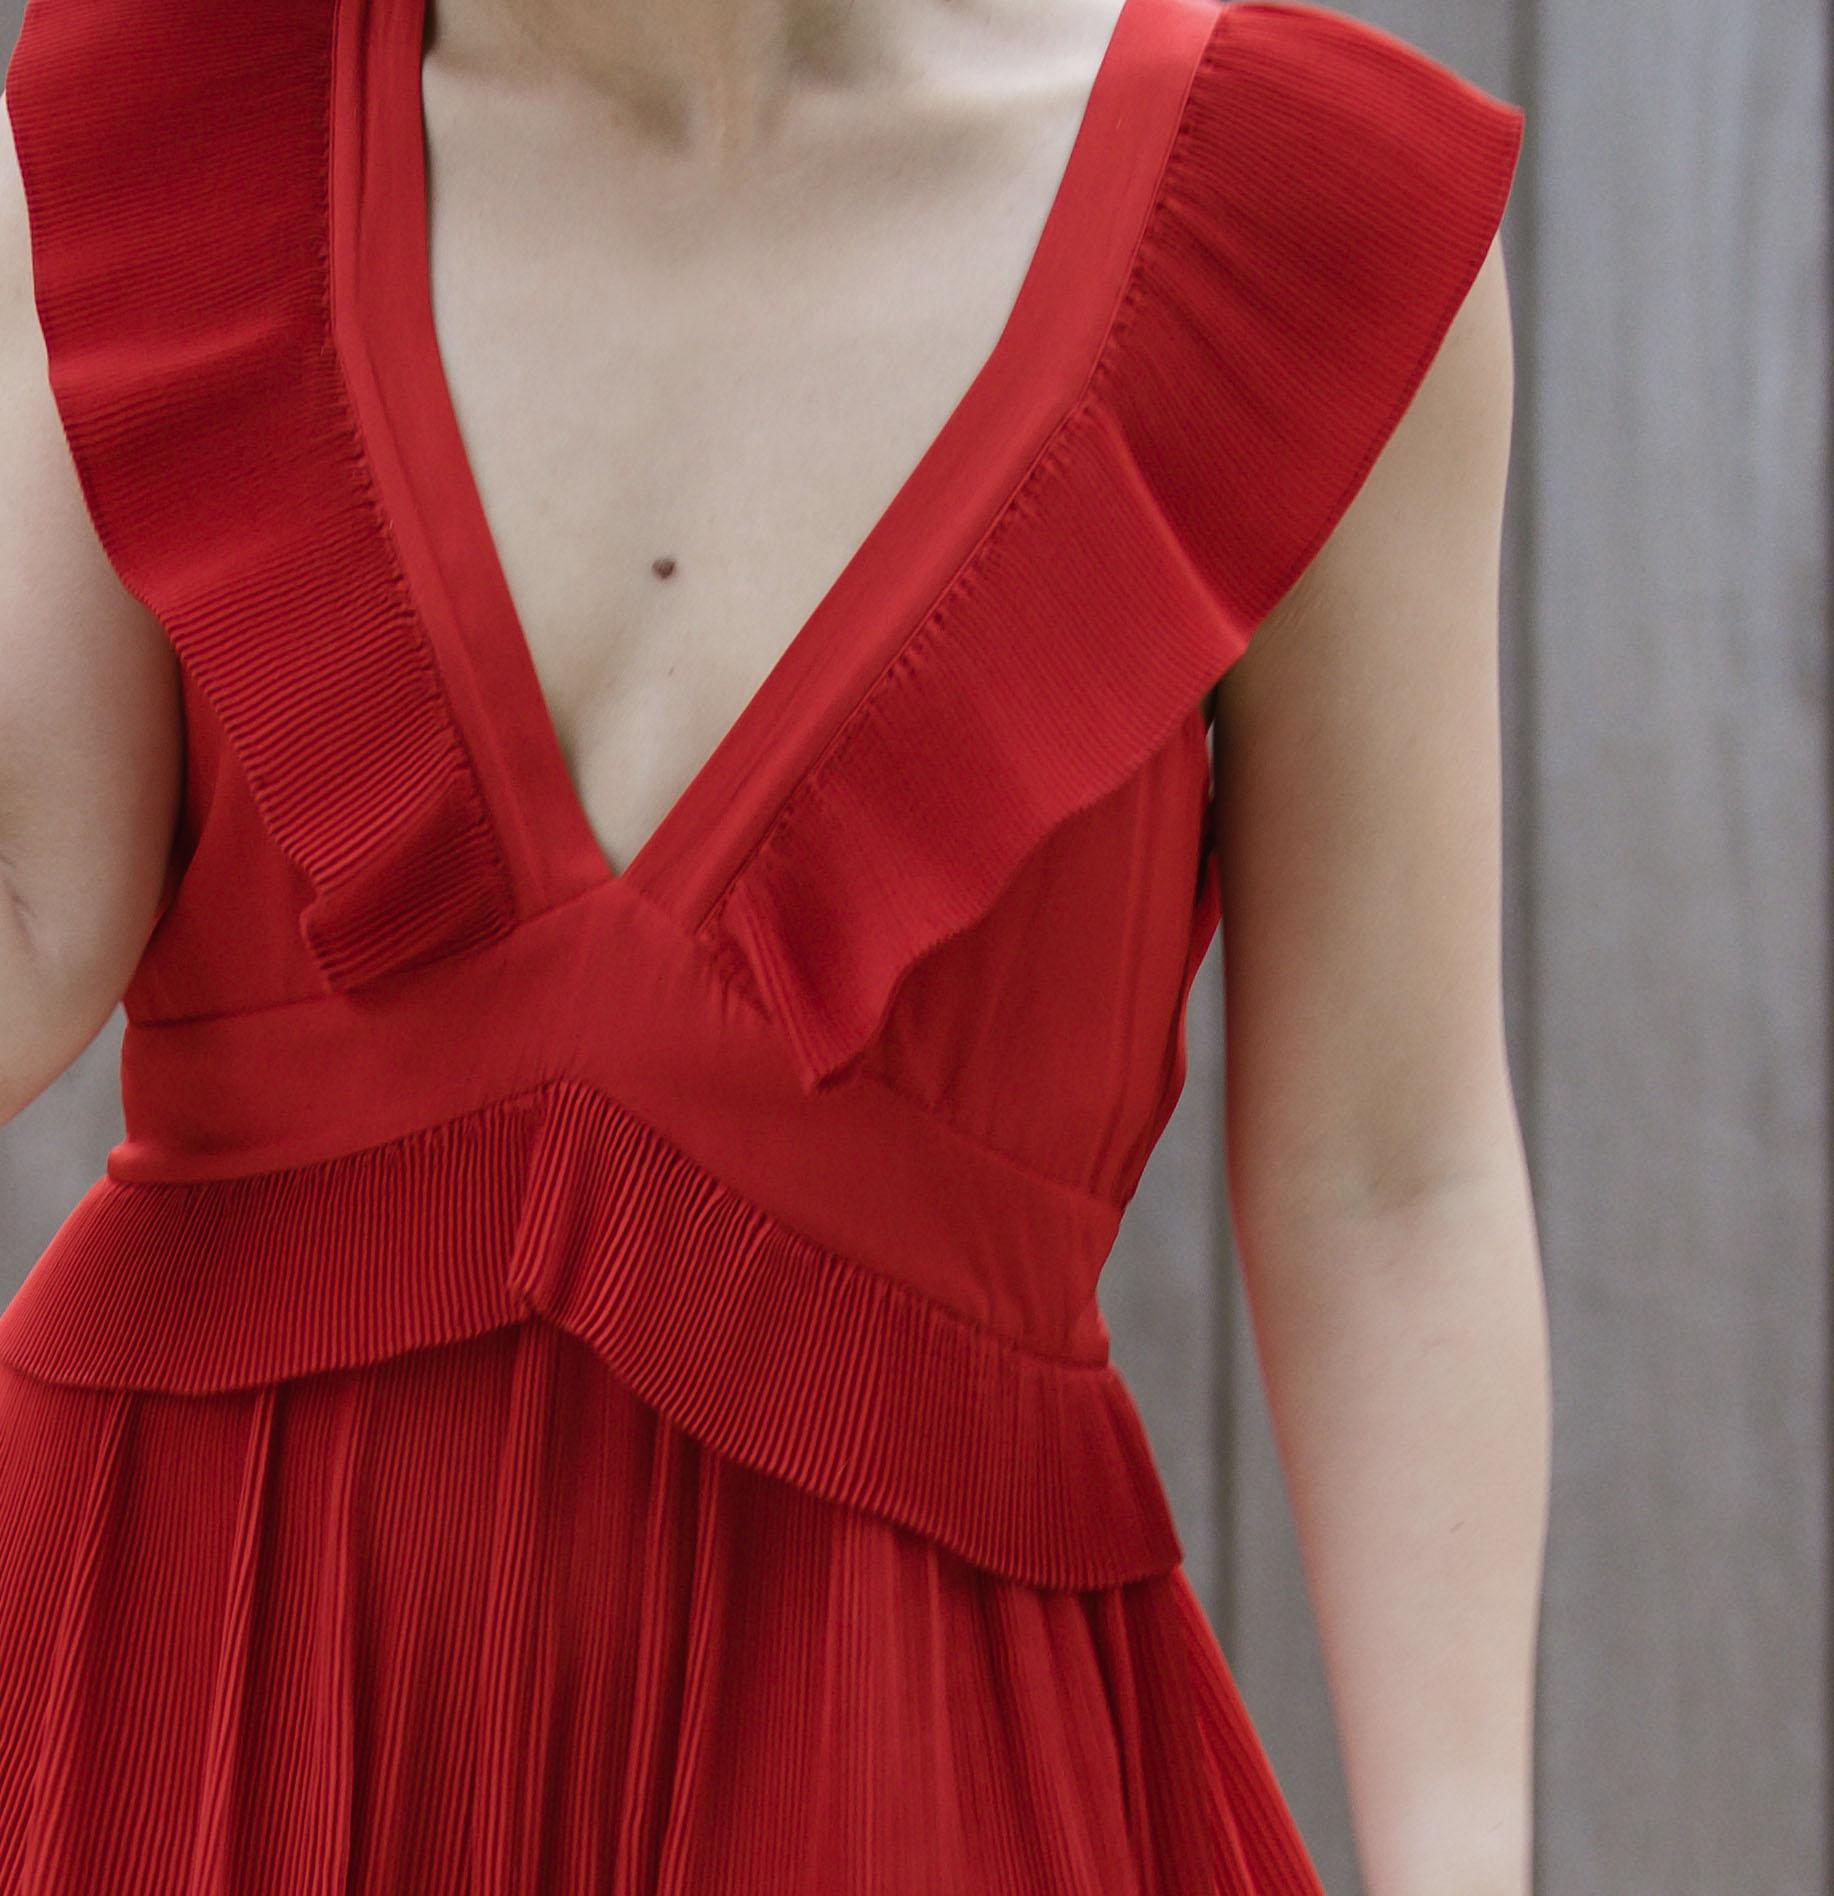 chelsea and walker red dress 6.JPG